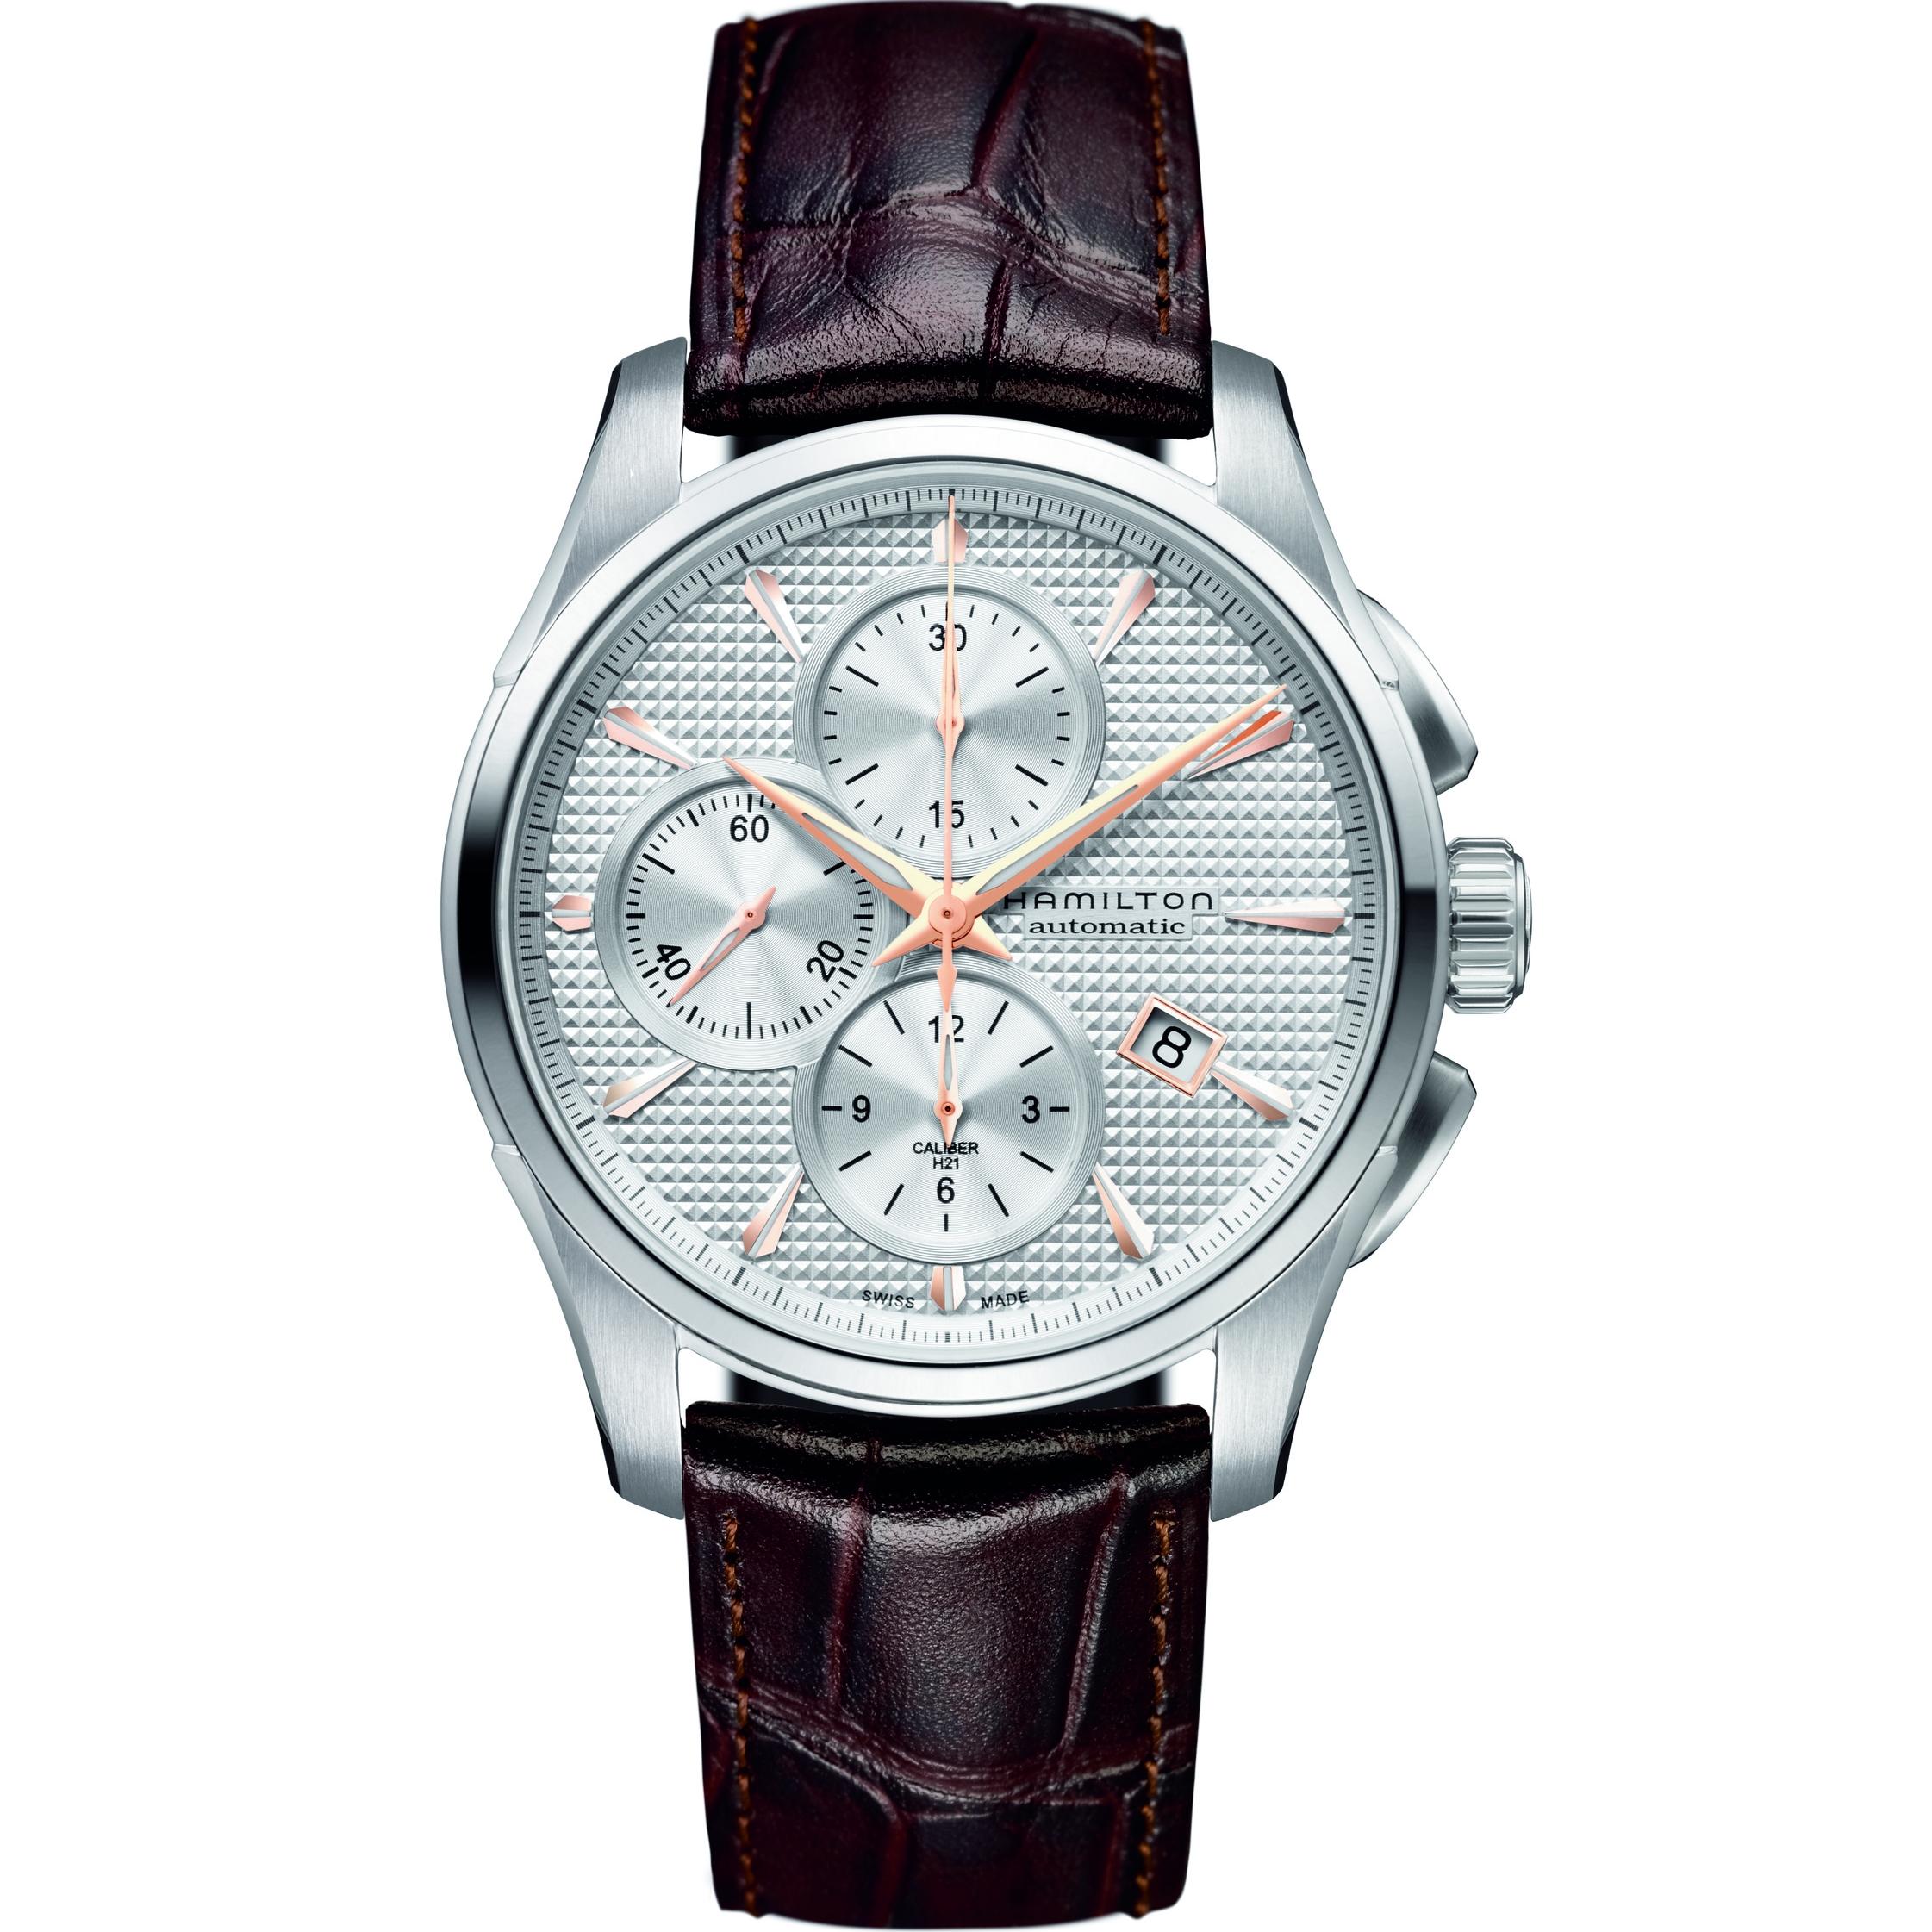 c54227fee Gents Hamilton Jazzmaster Chronograph Watch (H32596551) | WatchShop.com™